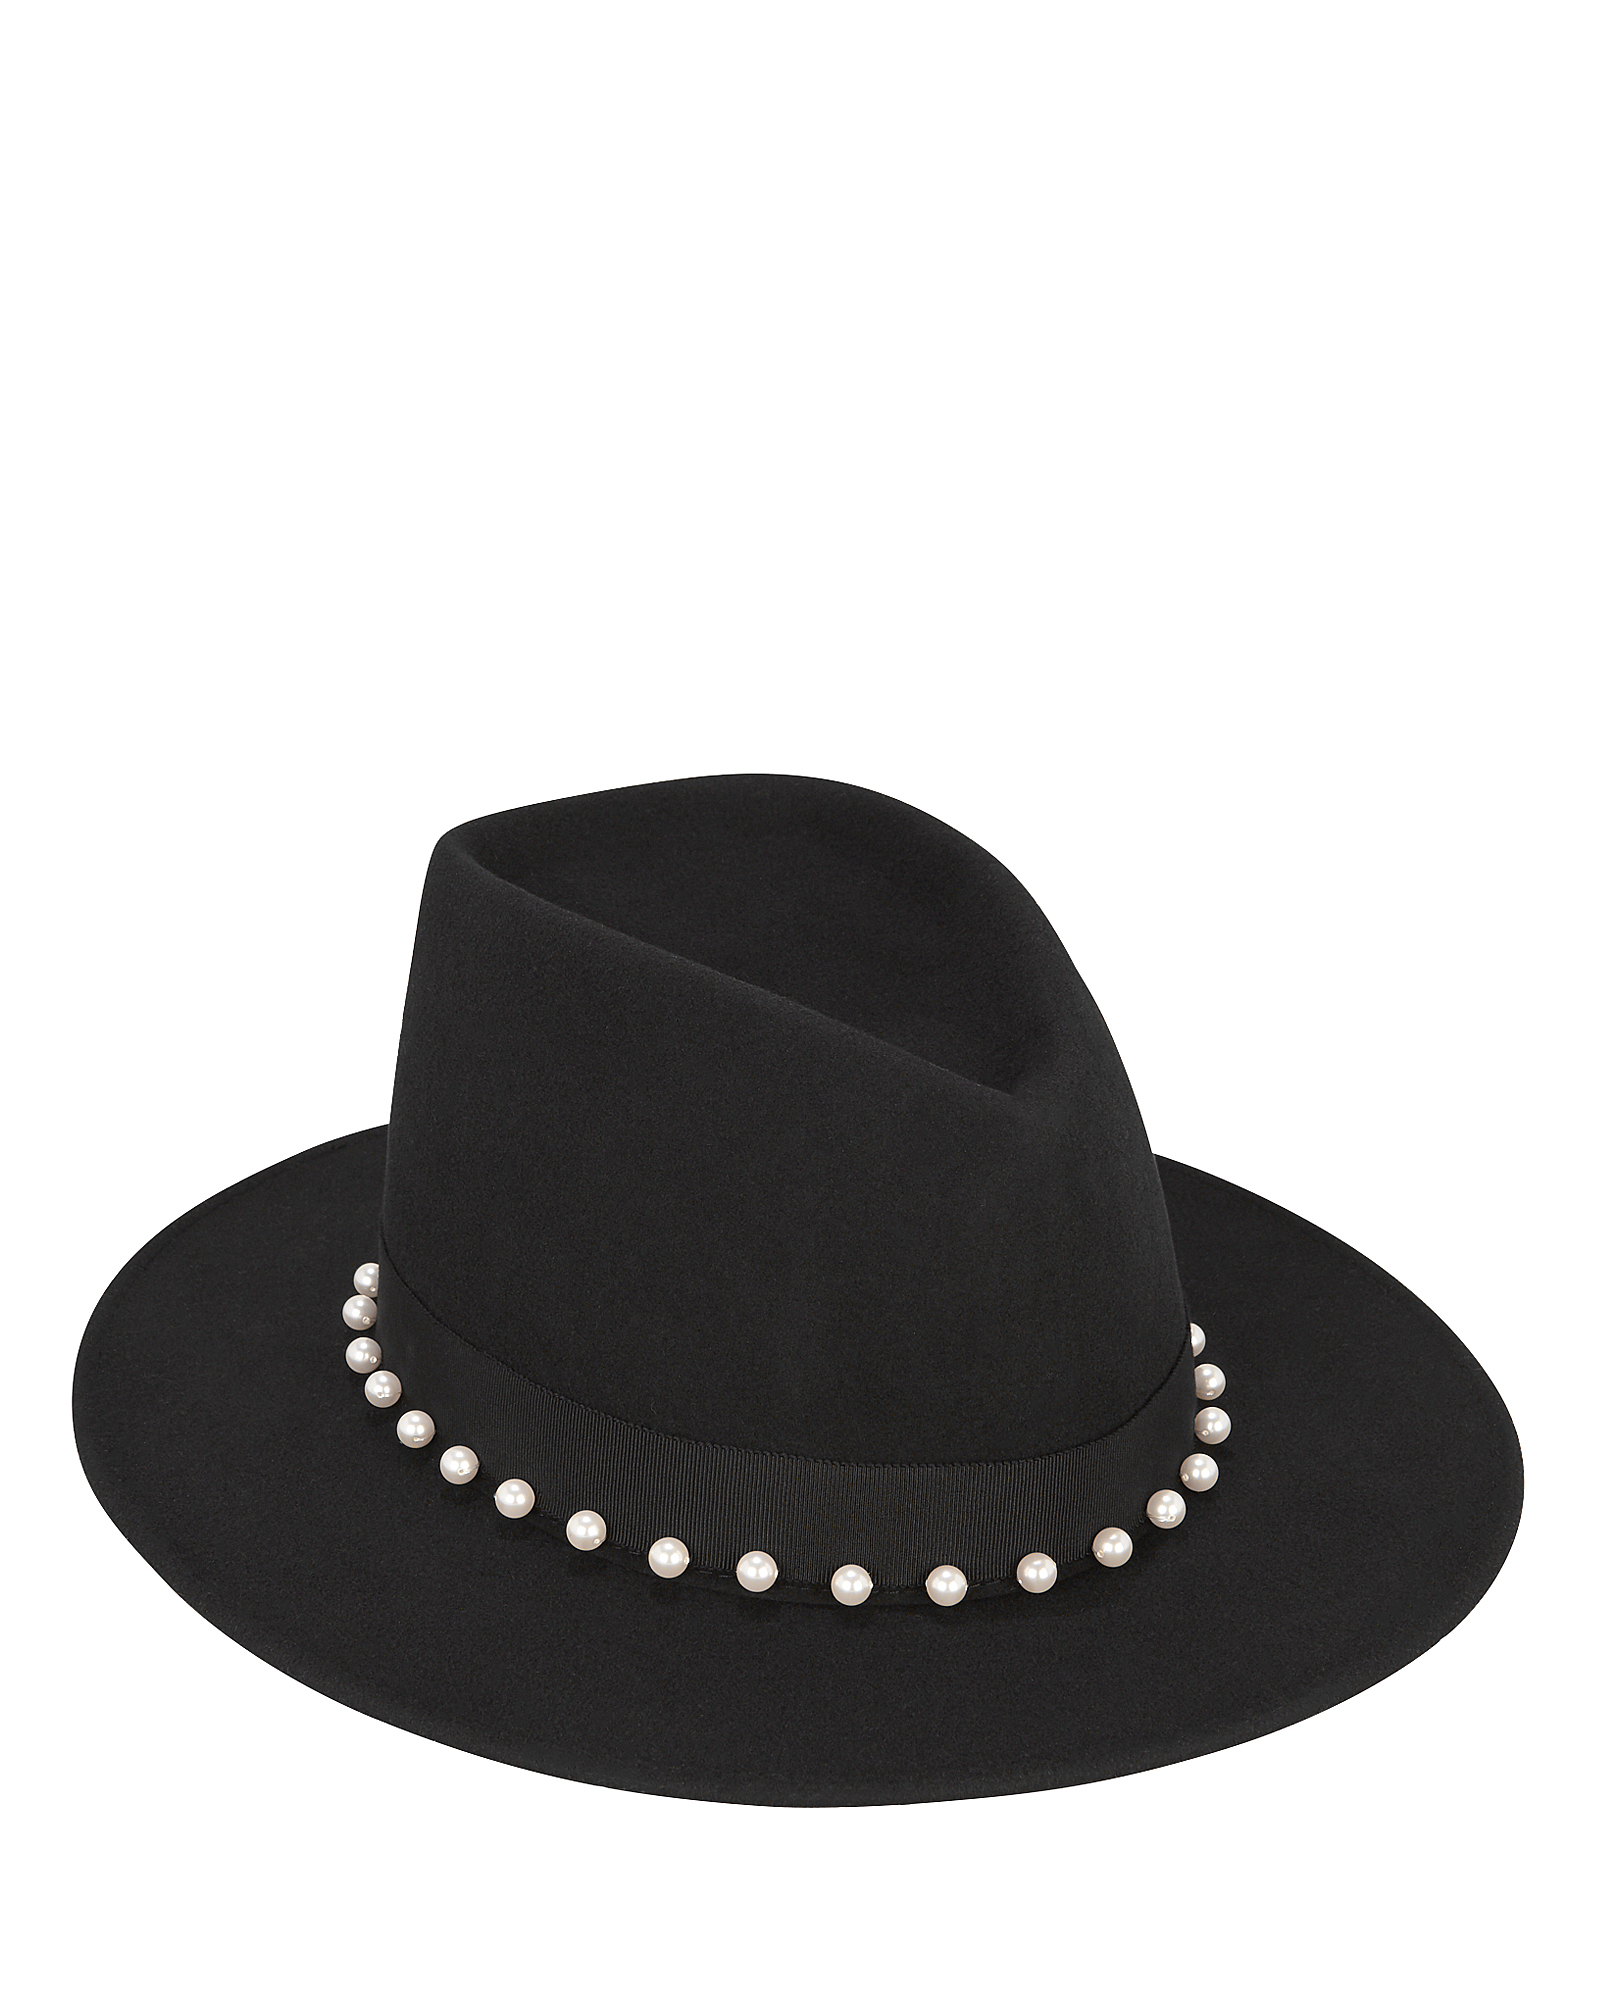 Blaine Embellished Fedora in Black